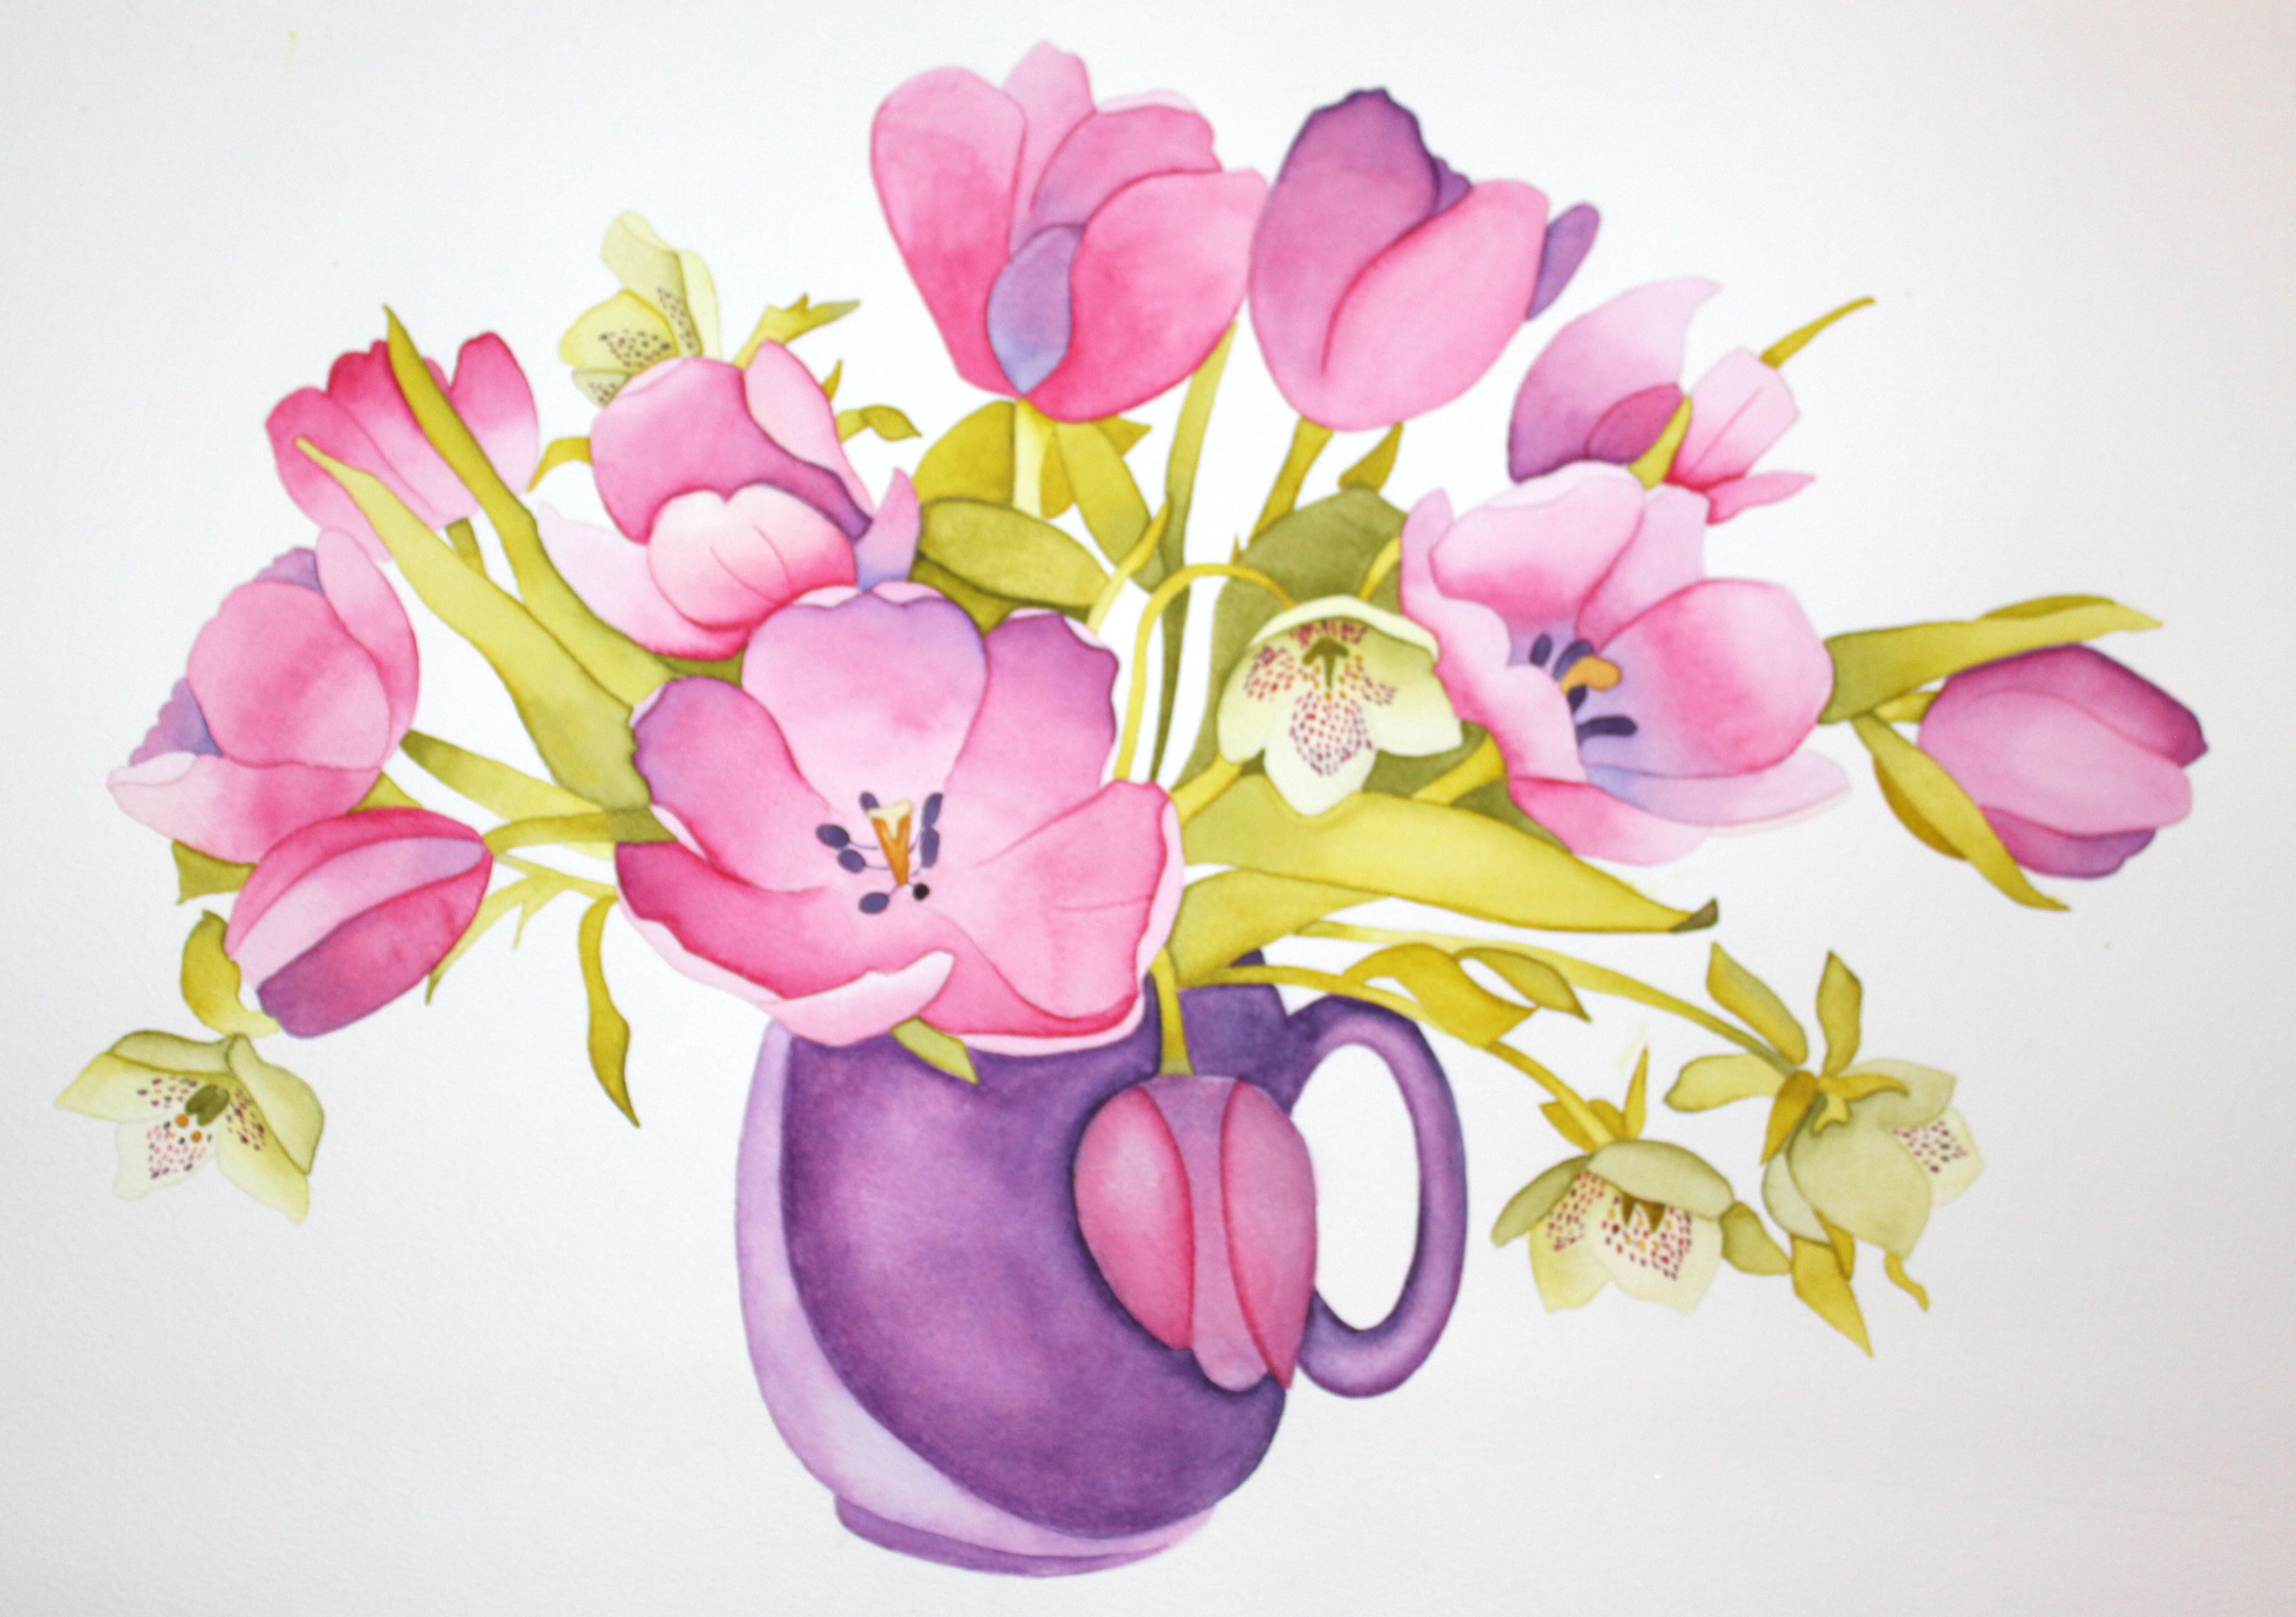 Watercolor Flowers Tumblr